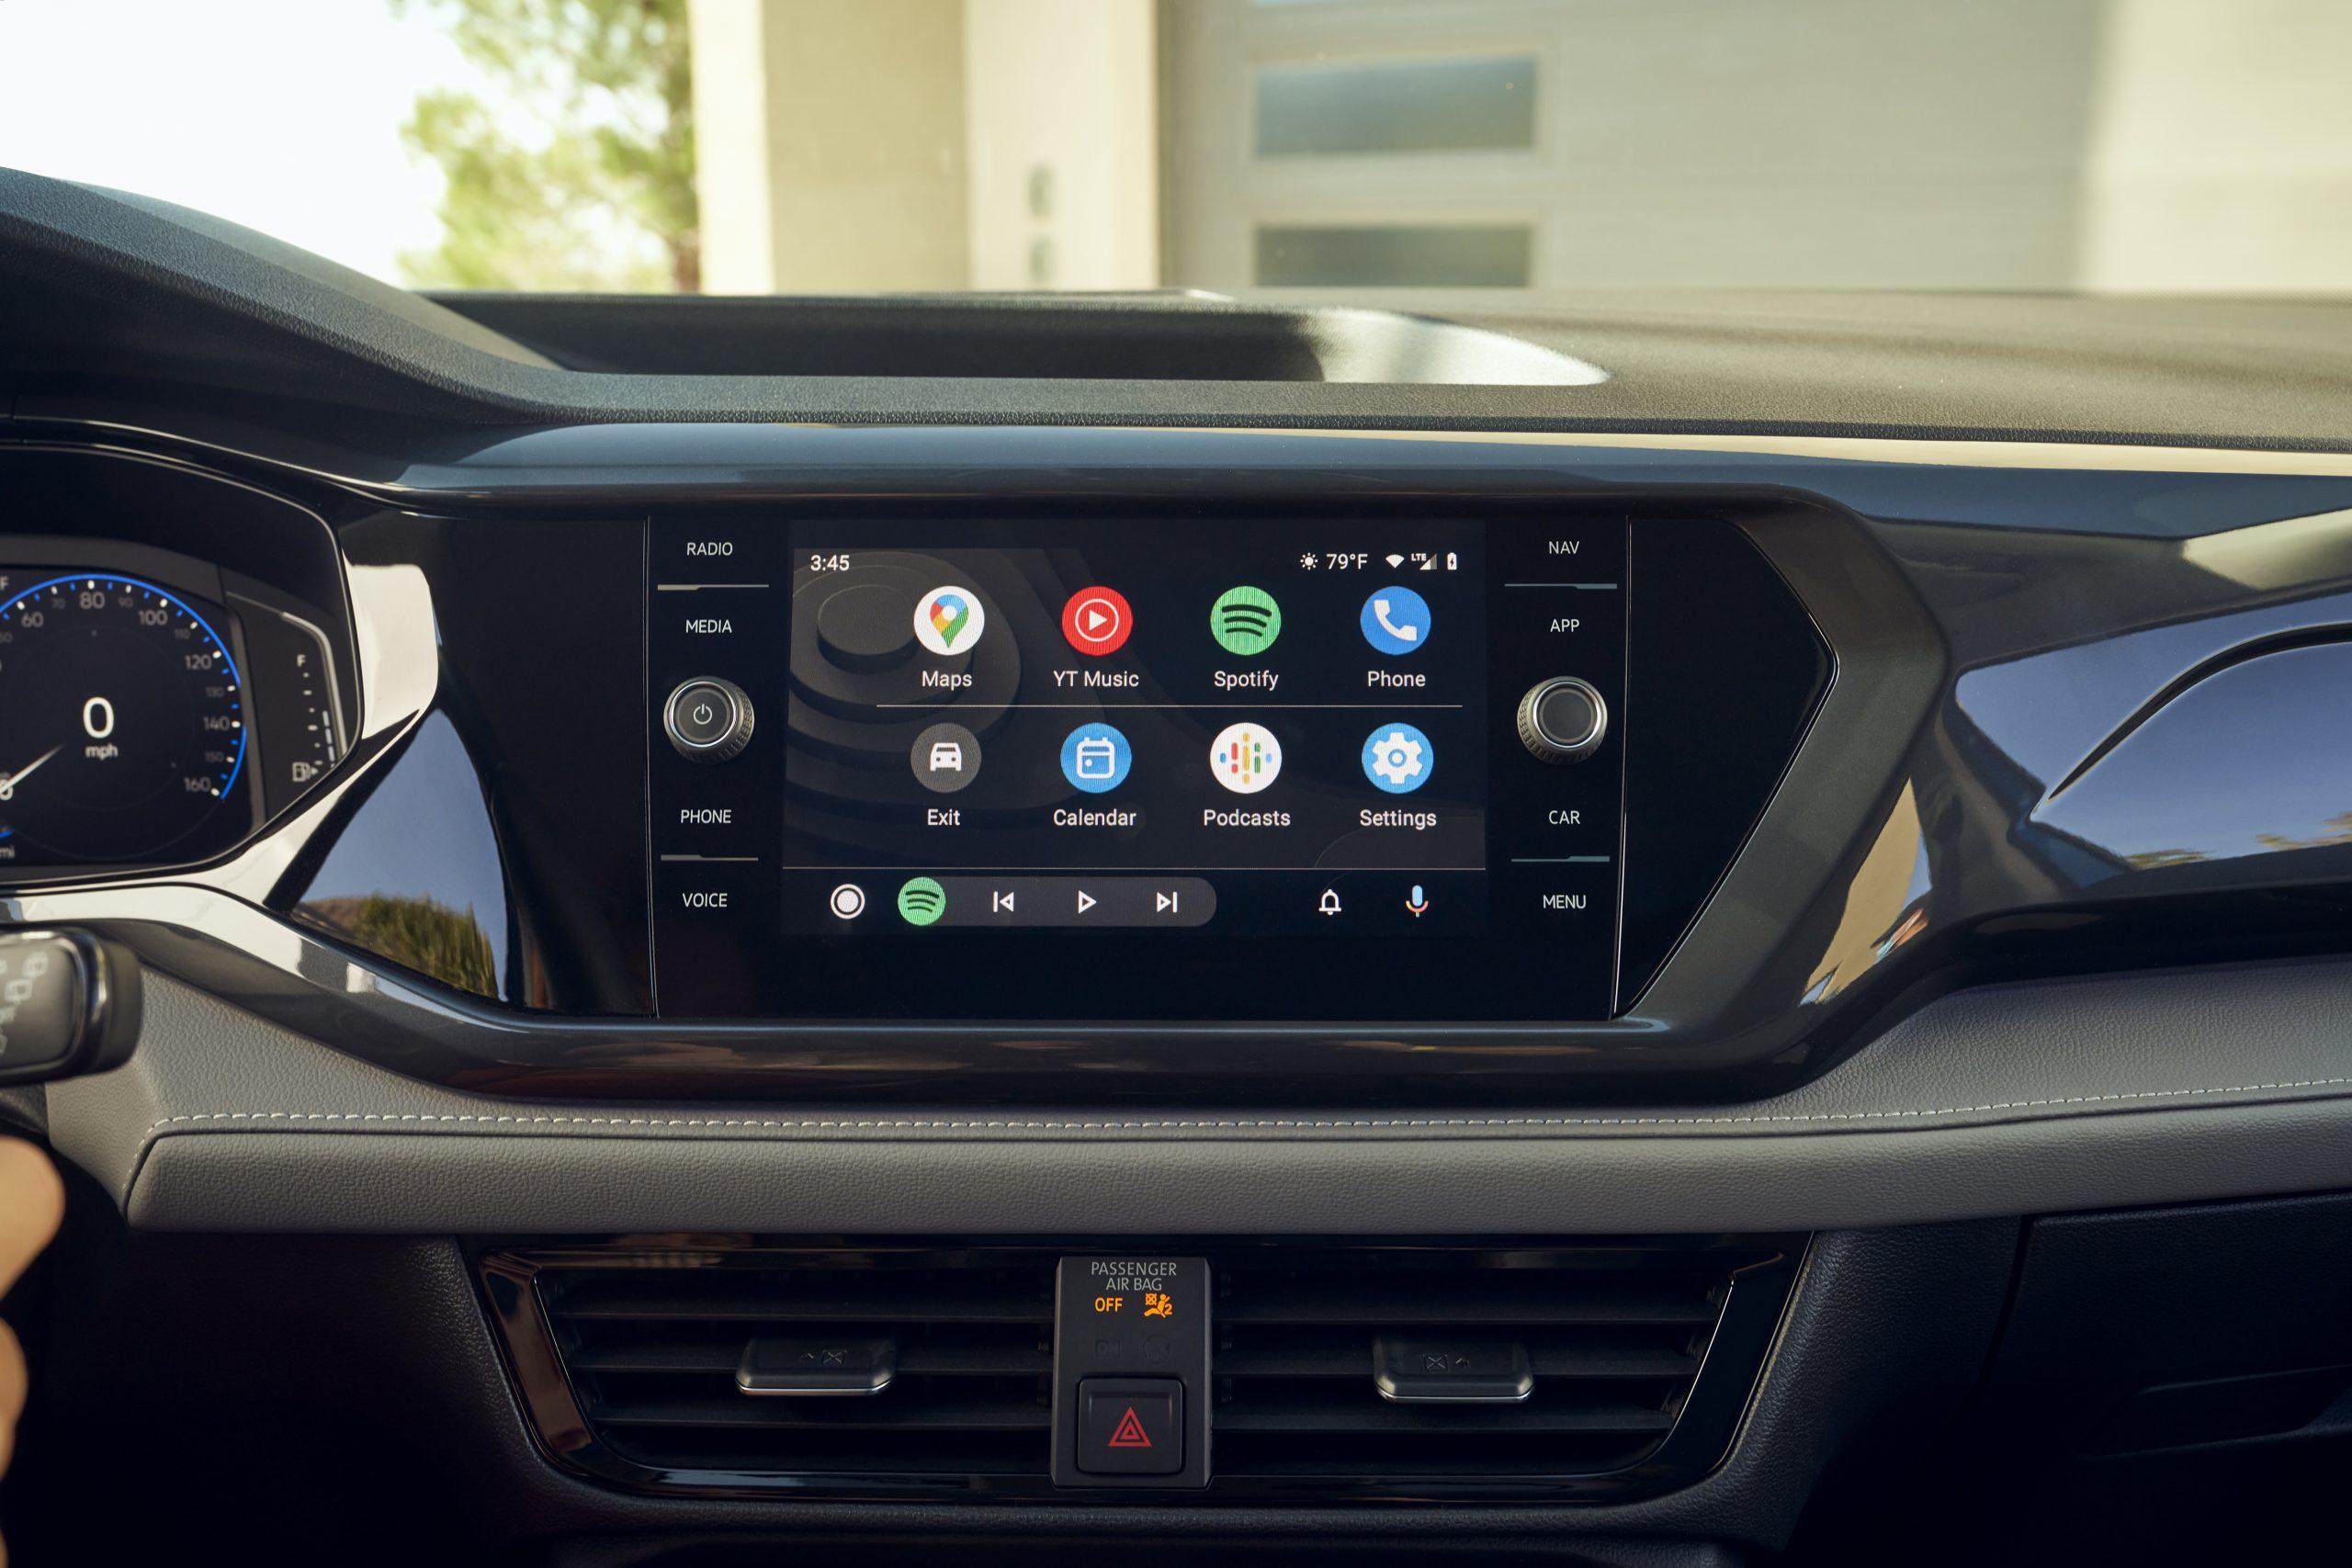 2022 Volkswagen Taos interior infotainment screen